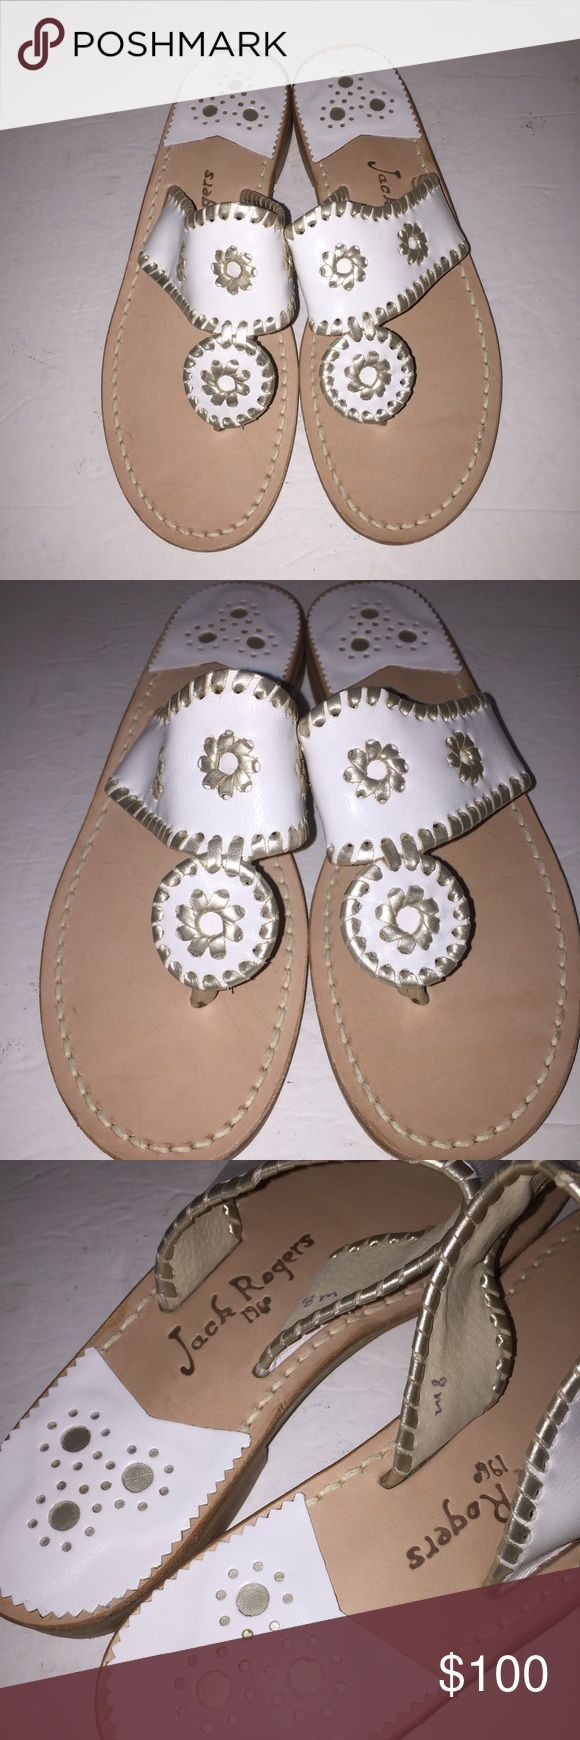 Jack Rogers White Navajo Sandals sz 8 New no box Jack Rogers Shoes Sandals